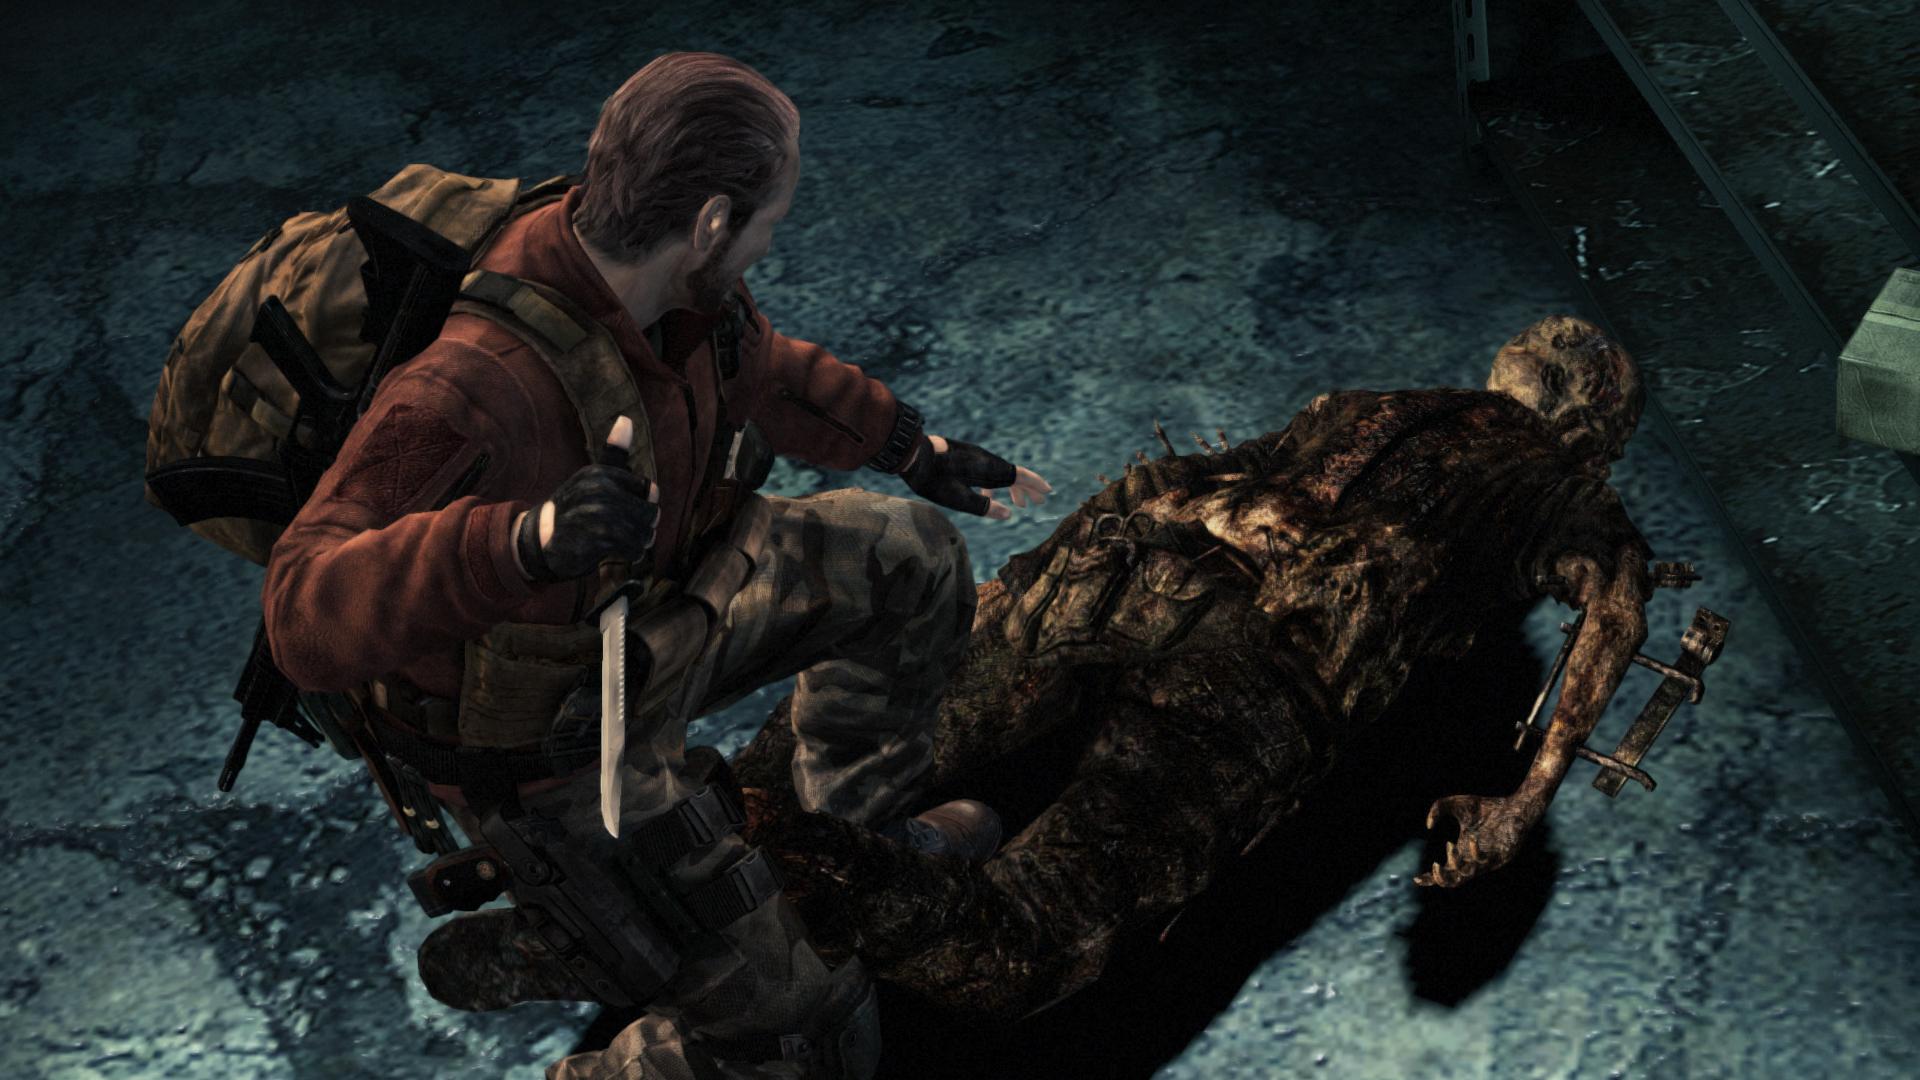 Resident Evil Revelations 2 ESPAÑOL PC Full + Update 2.1 (CODEX) + REPACK 3 DVD5 (JPW) 7